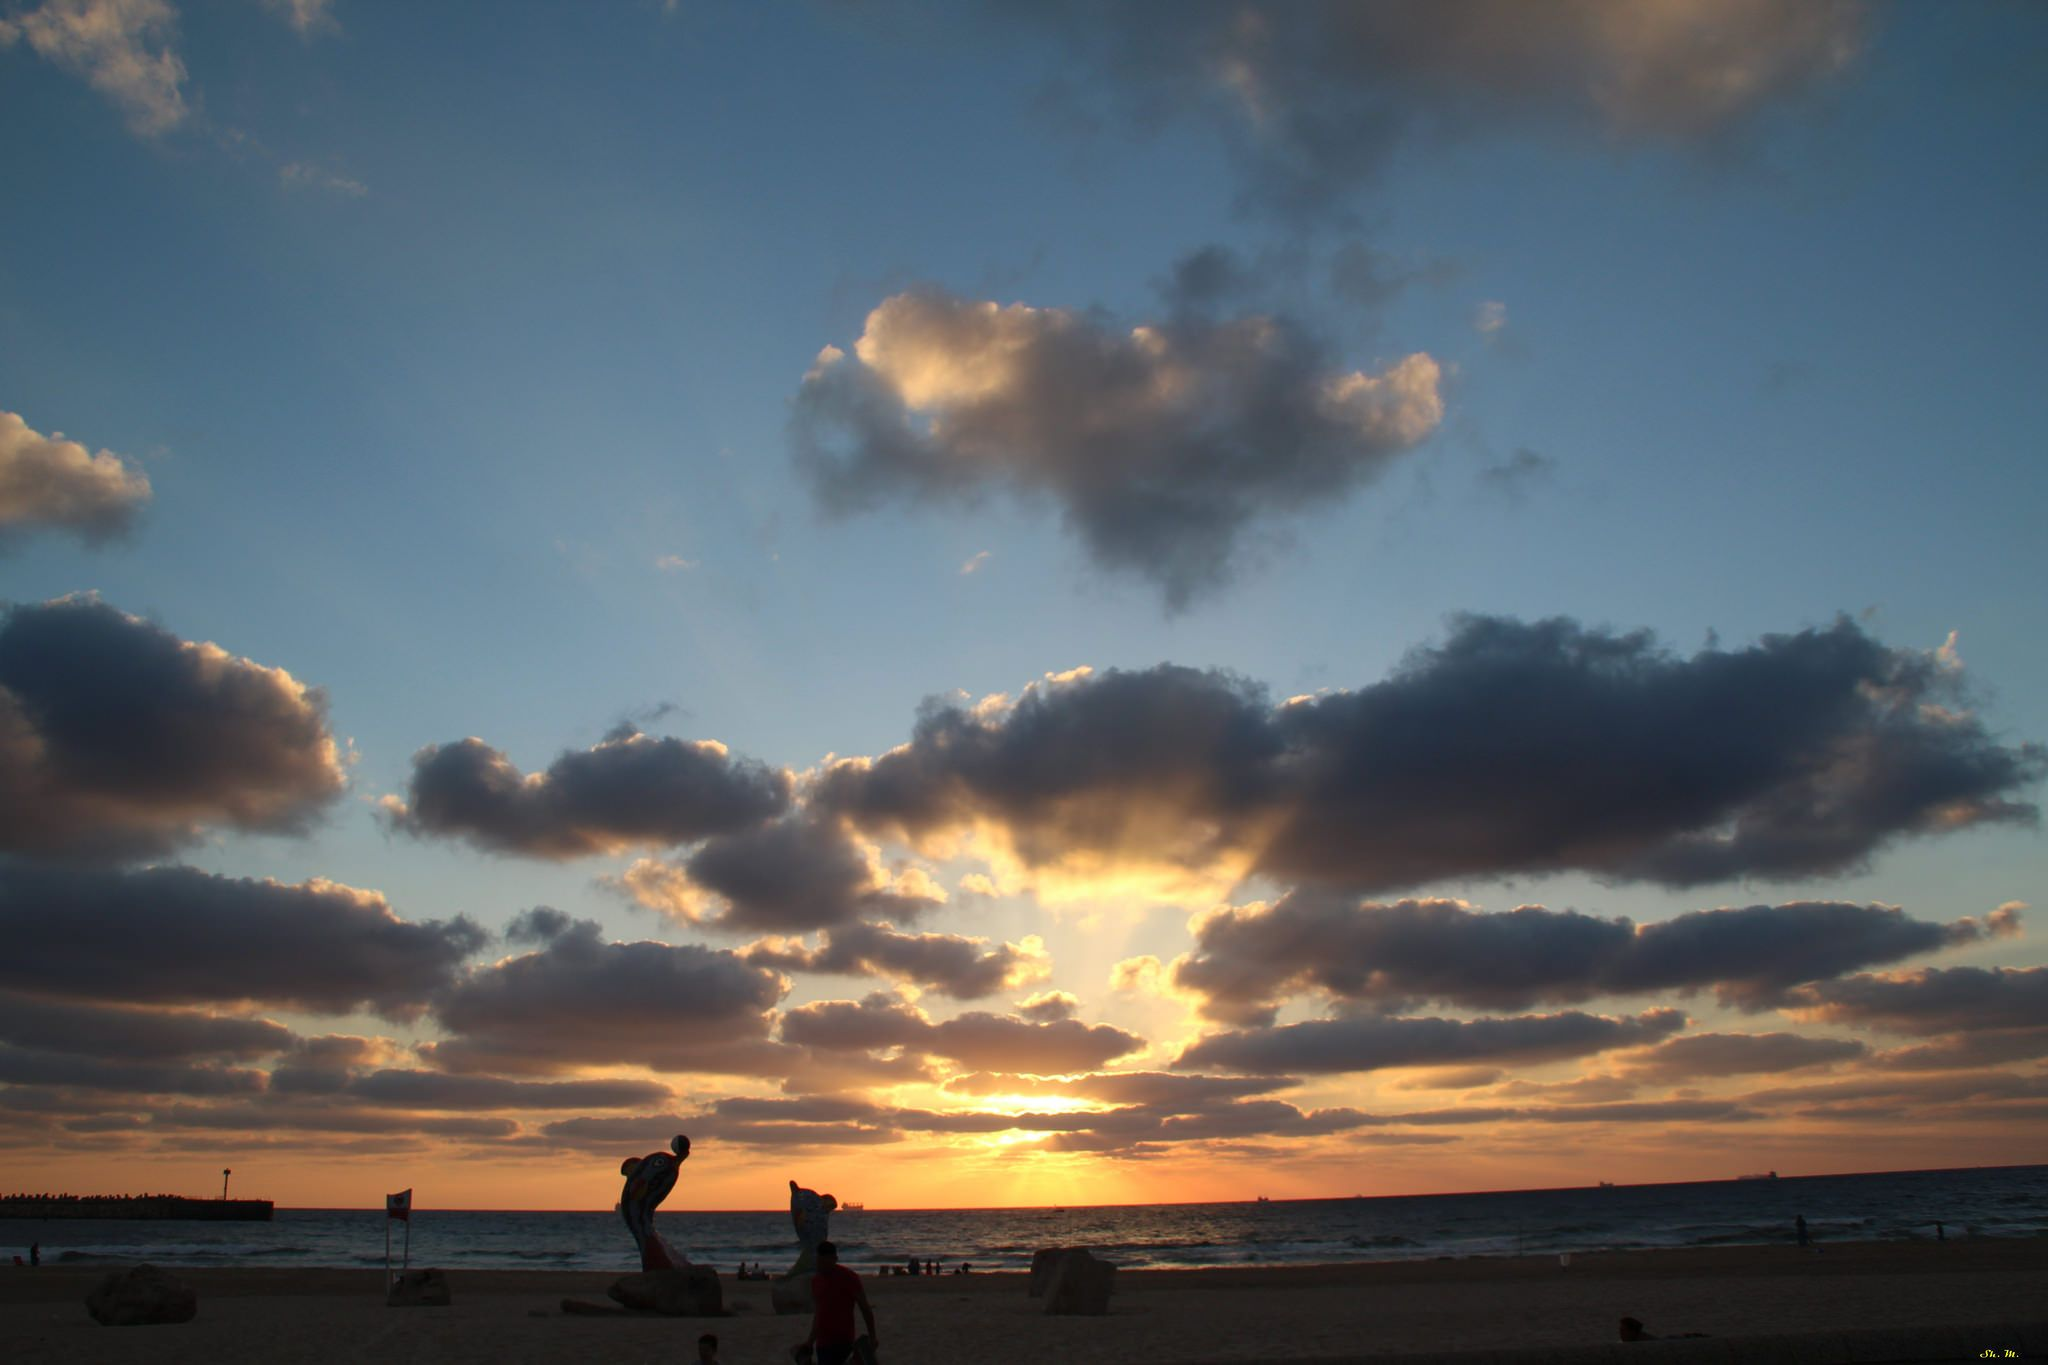 https://flic.kr/p/x948QE | Sunset | The coast of Ashdod, Israel. 2015.